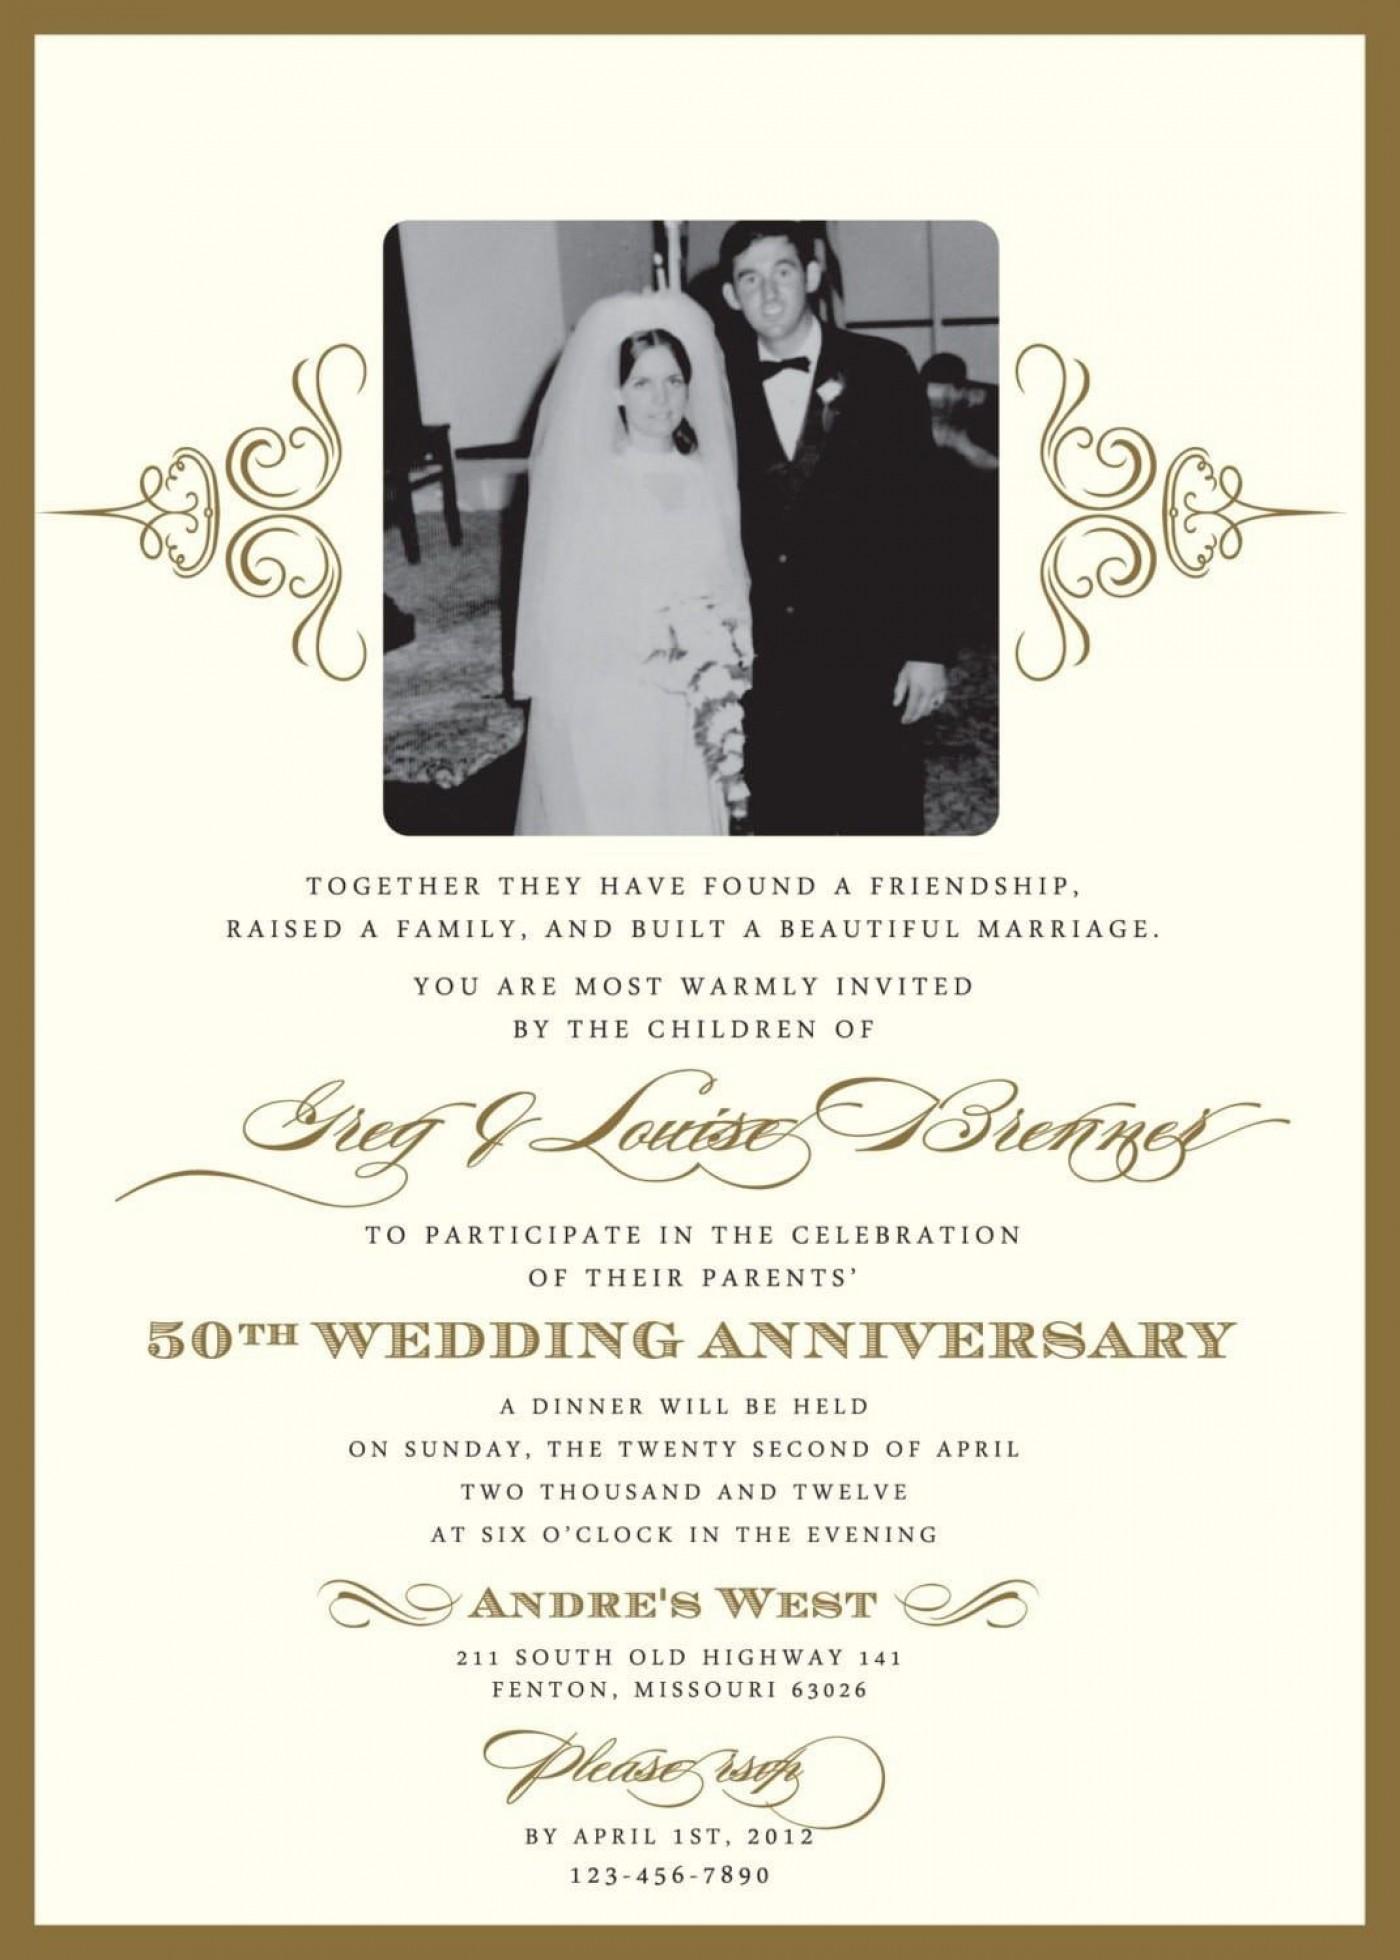 000 Wondrou 50th Anniversary Invitation Template High Resolution  Wedding Microsoft Word Free Download1400